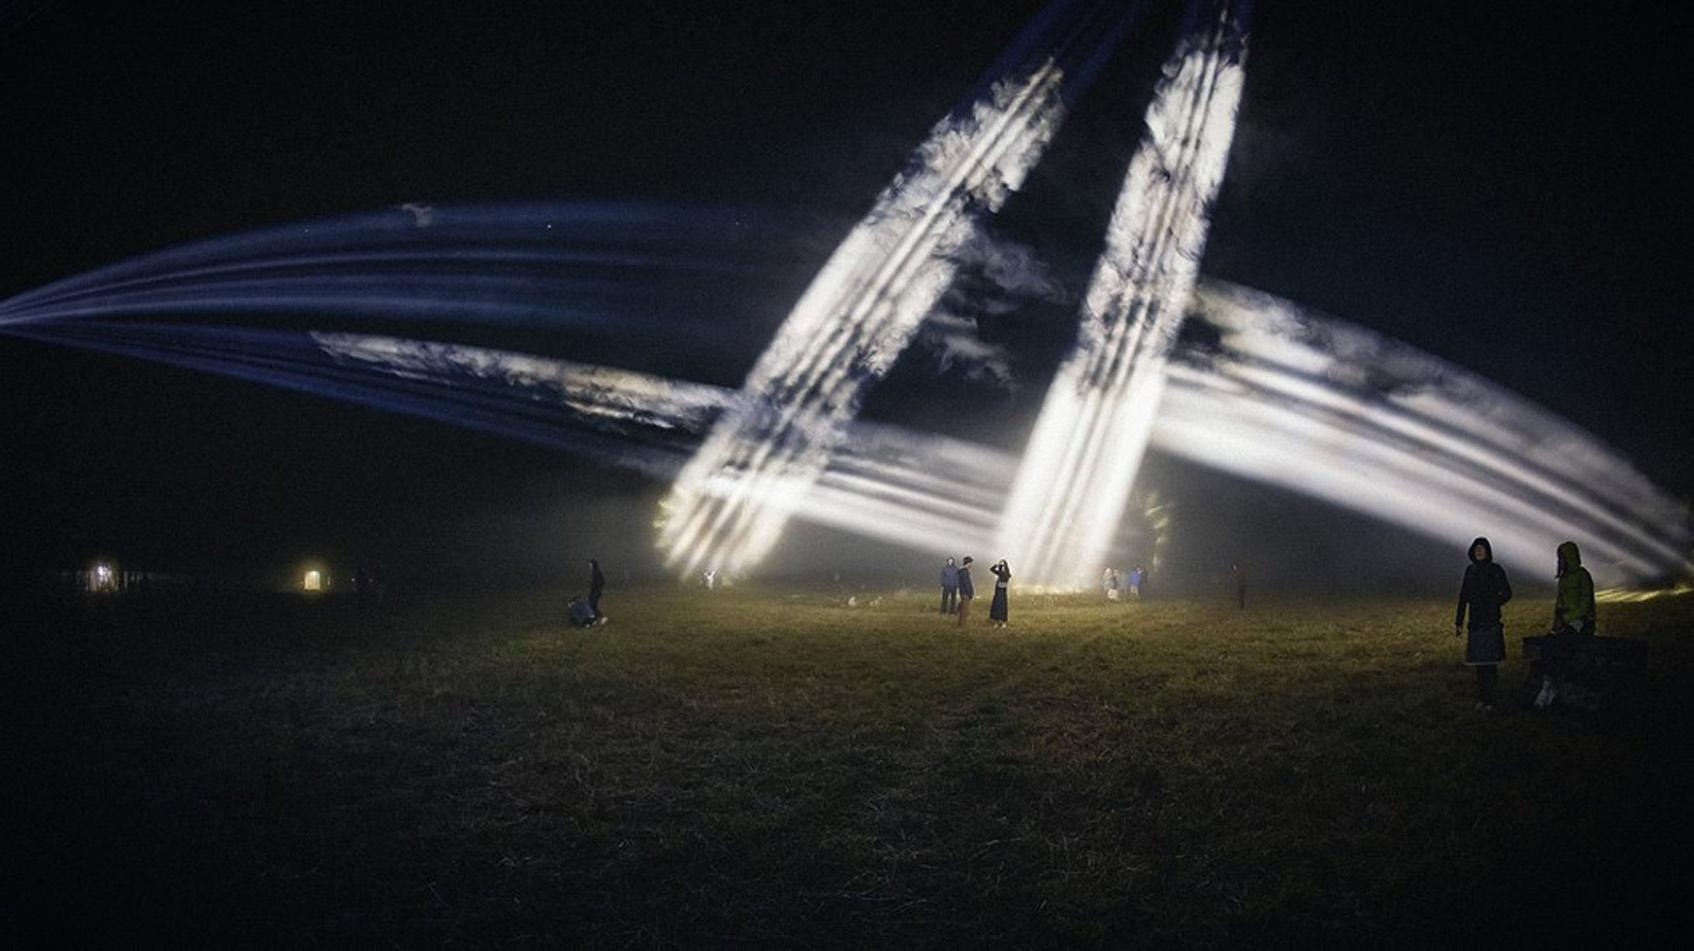 Фестиваль Signal в Никола-Ленивце